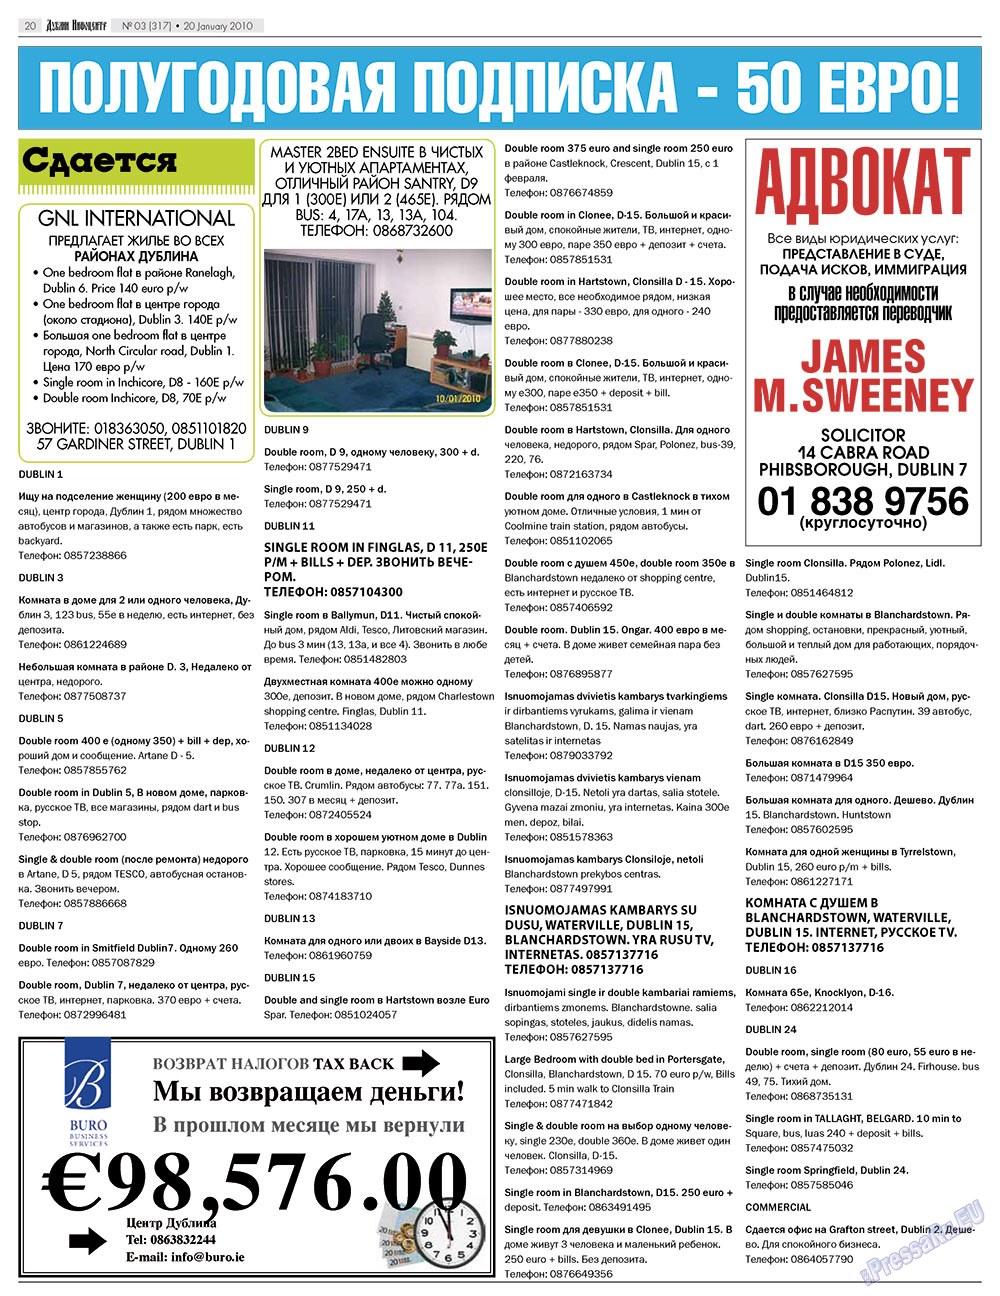 Дублин инфоцентр (газета). 2010 год, номер 3, стр. 20